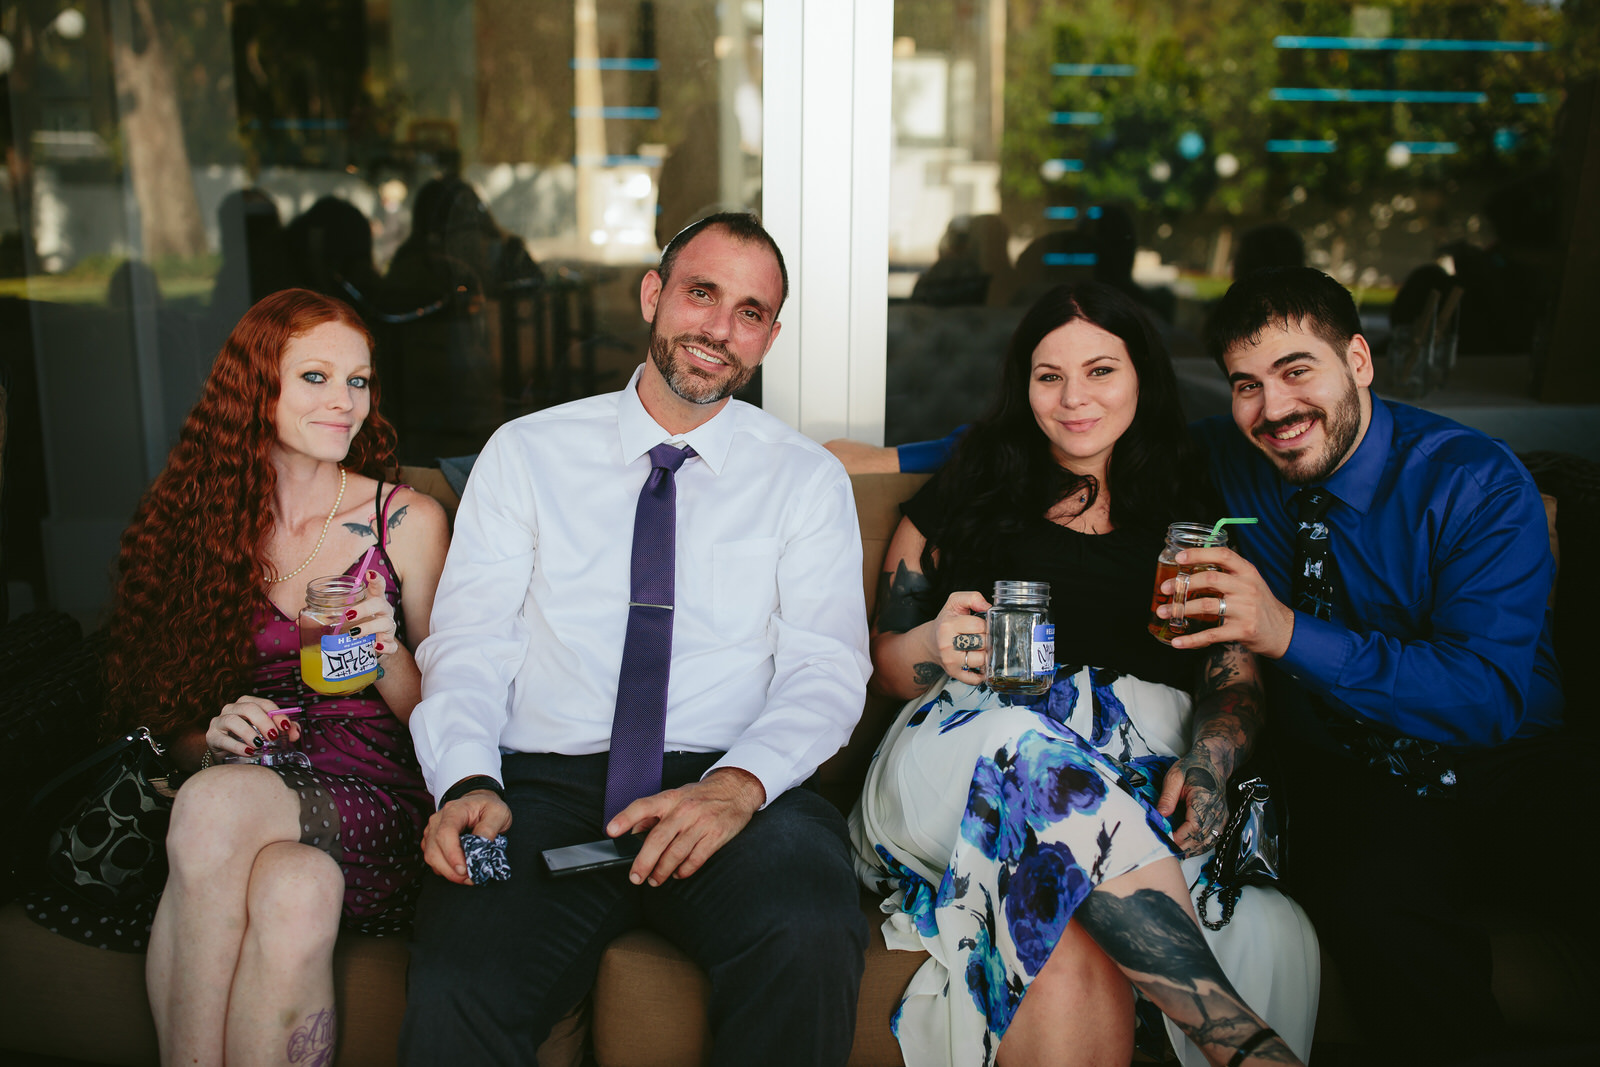 wedding-guest-candids-florida-backyard-wedding.jpg